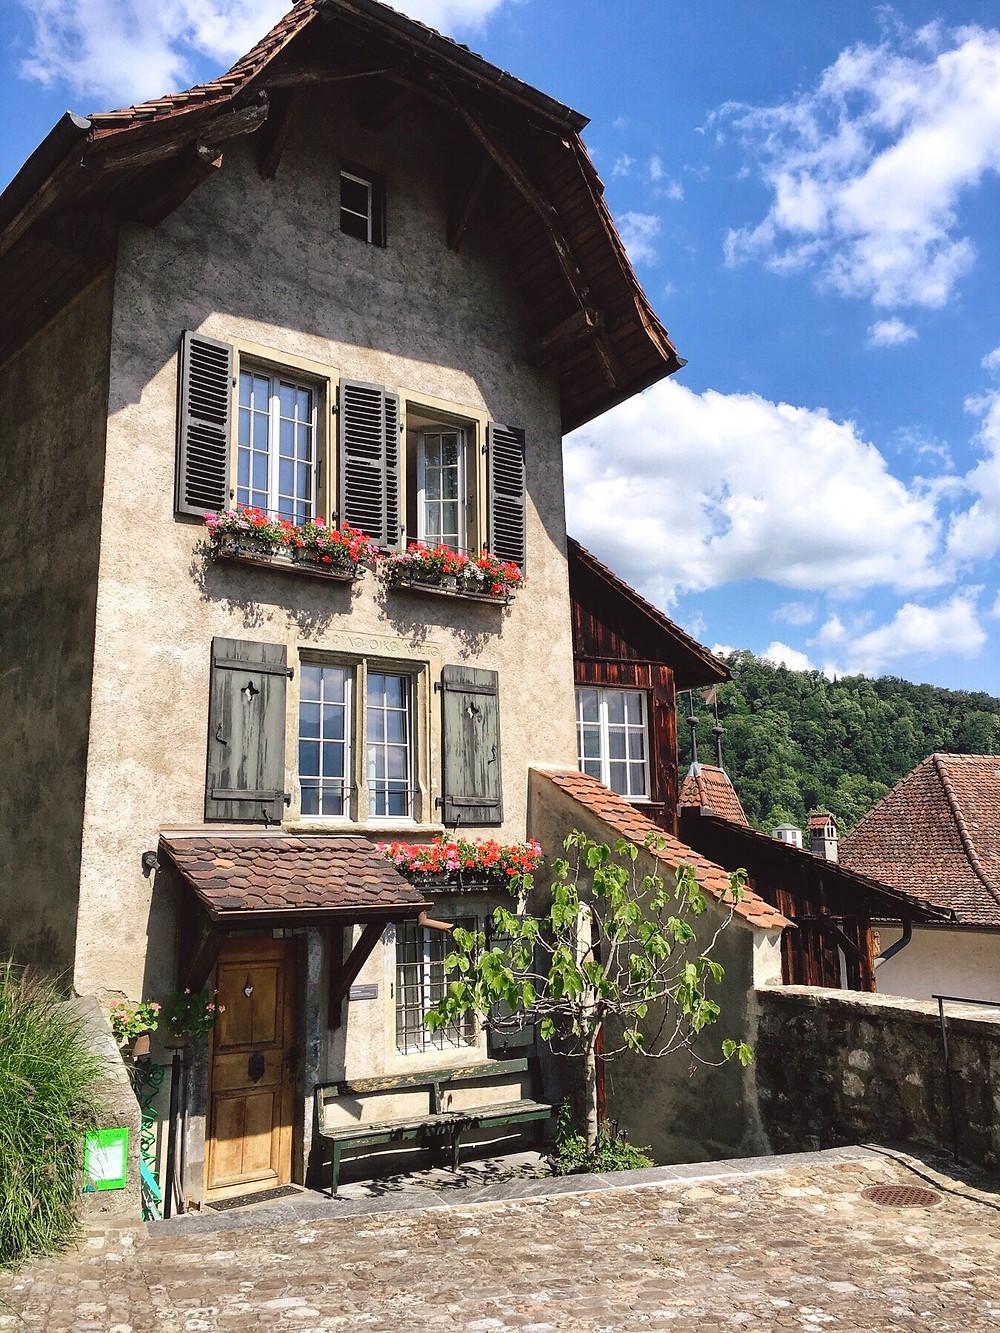 Cute Swiss house in city of Thun